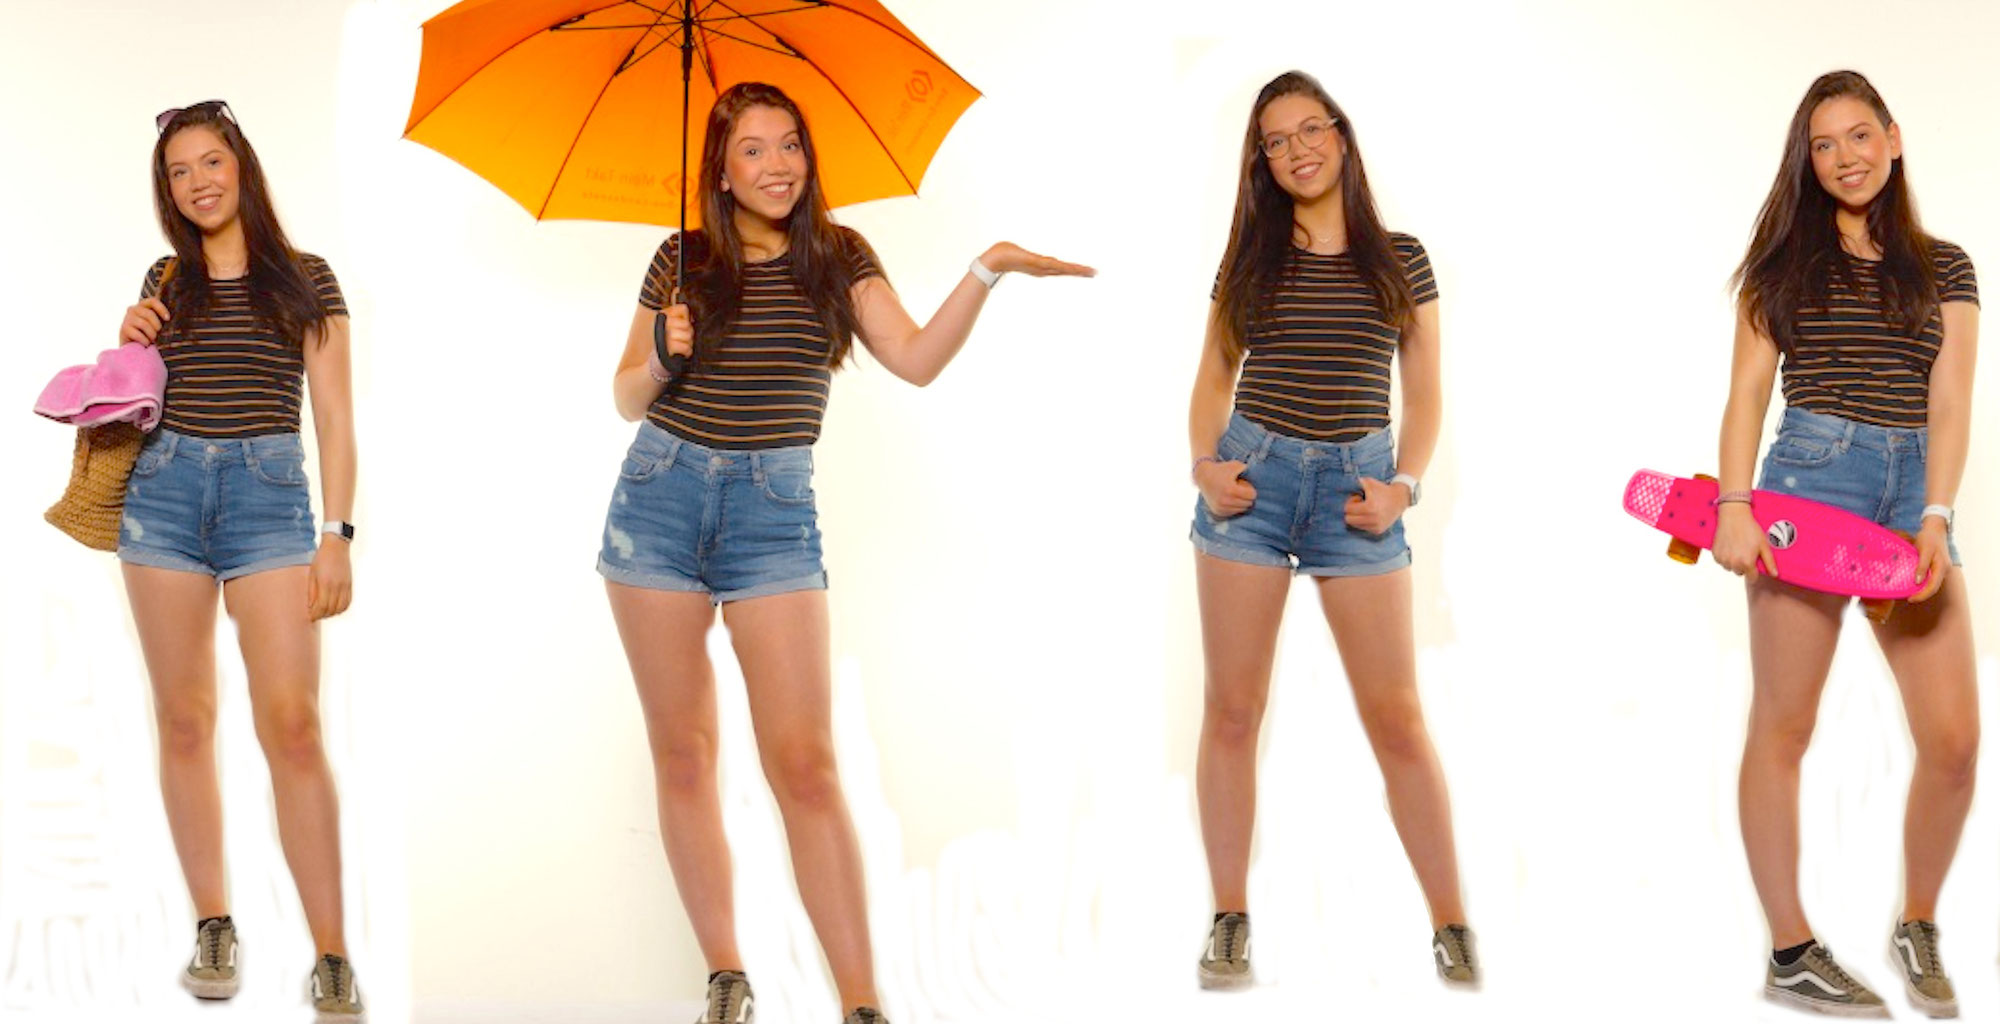 Lina, ein Model per Zufall